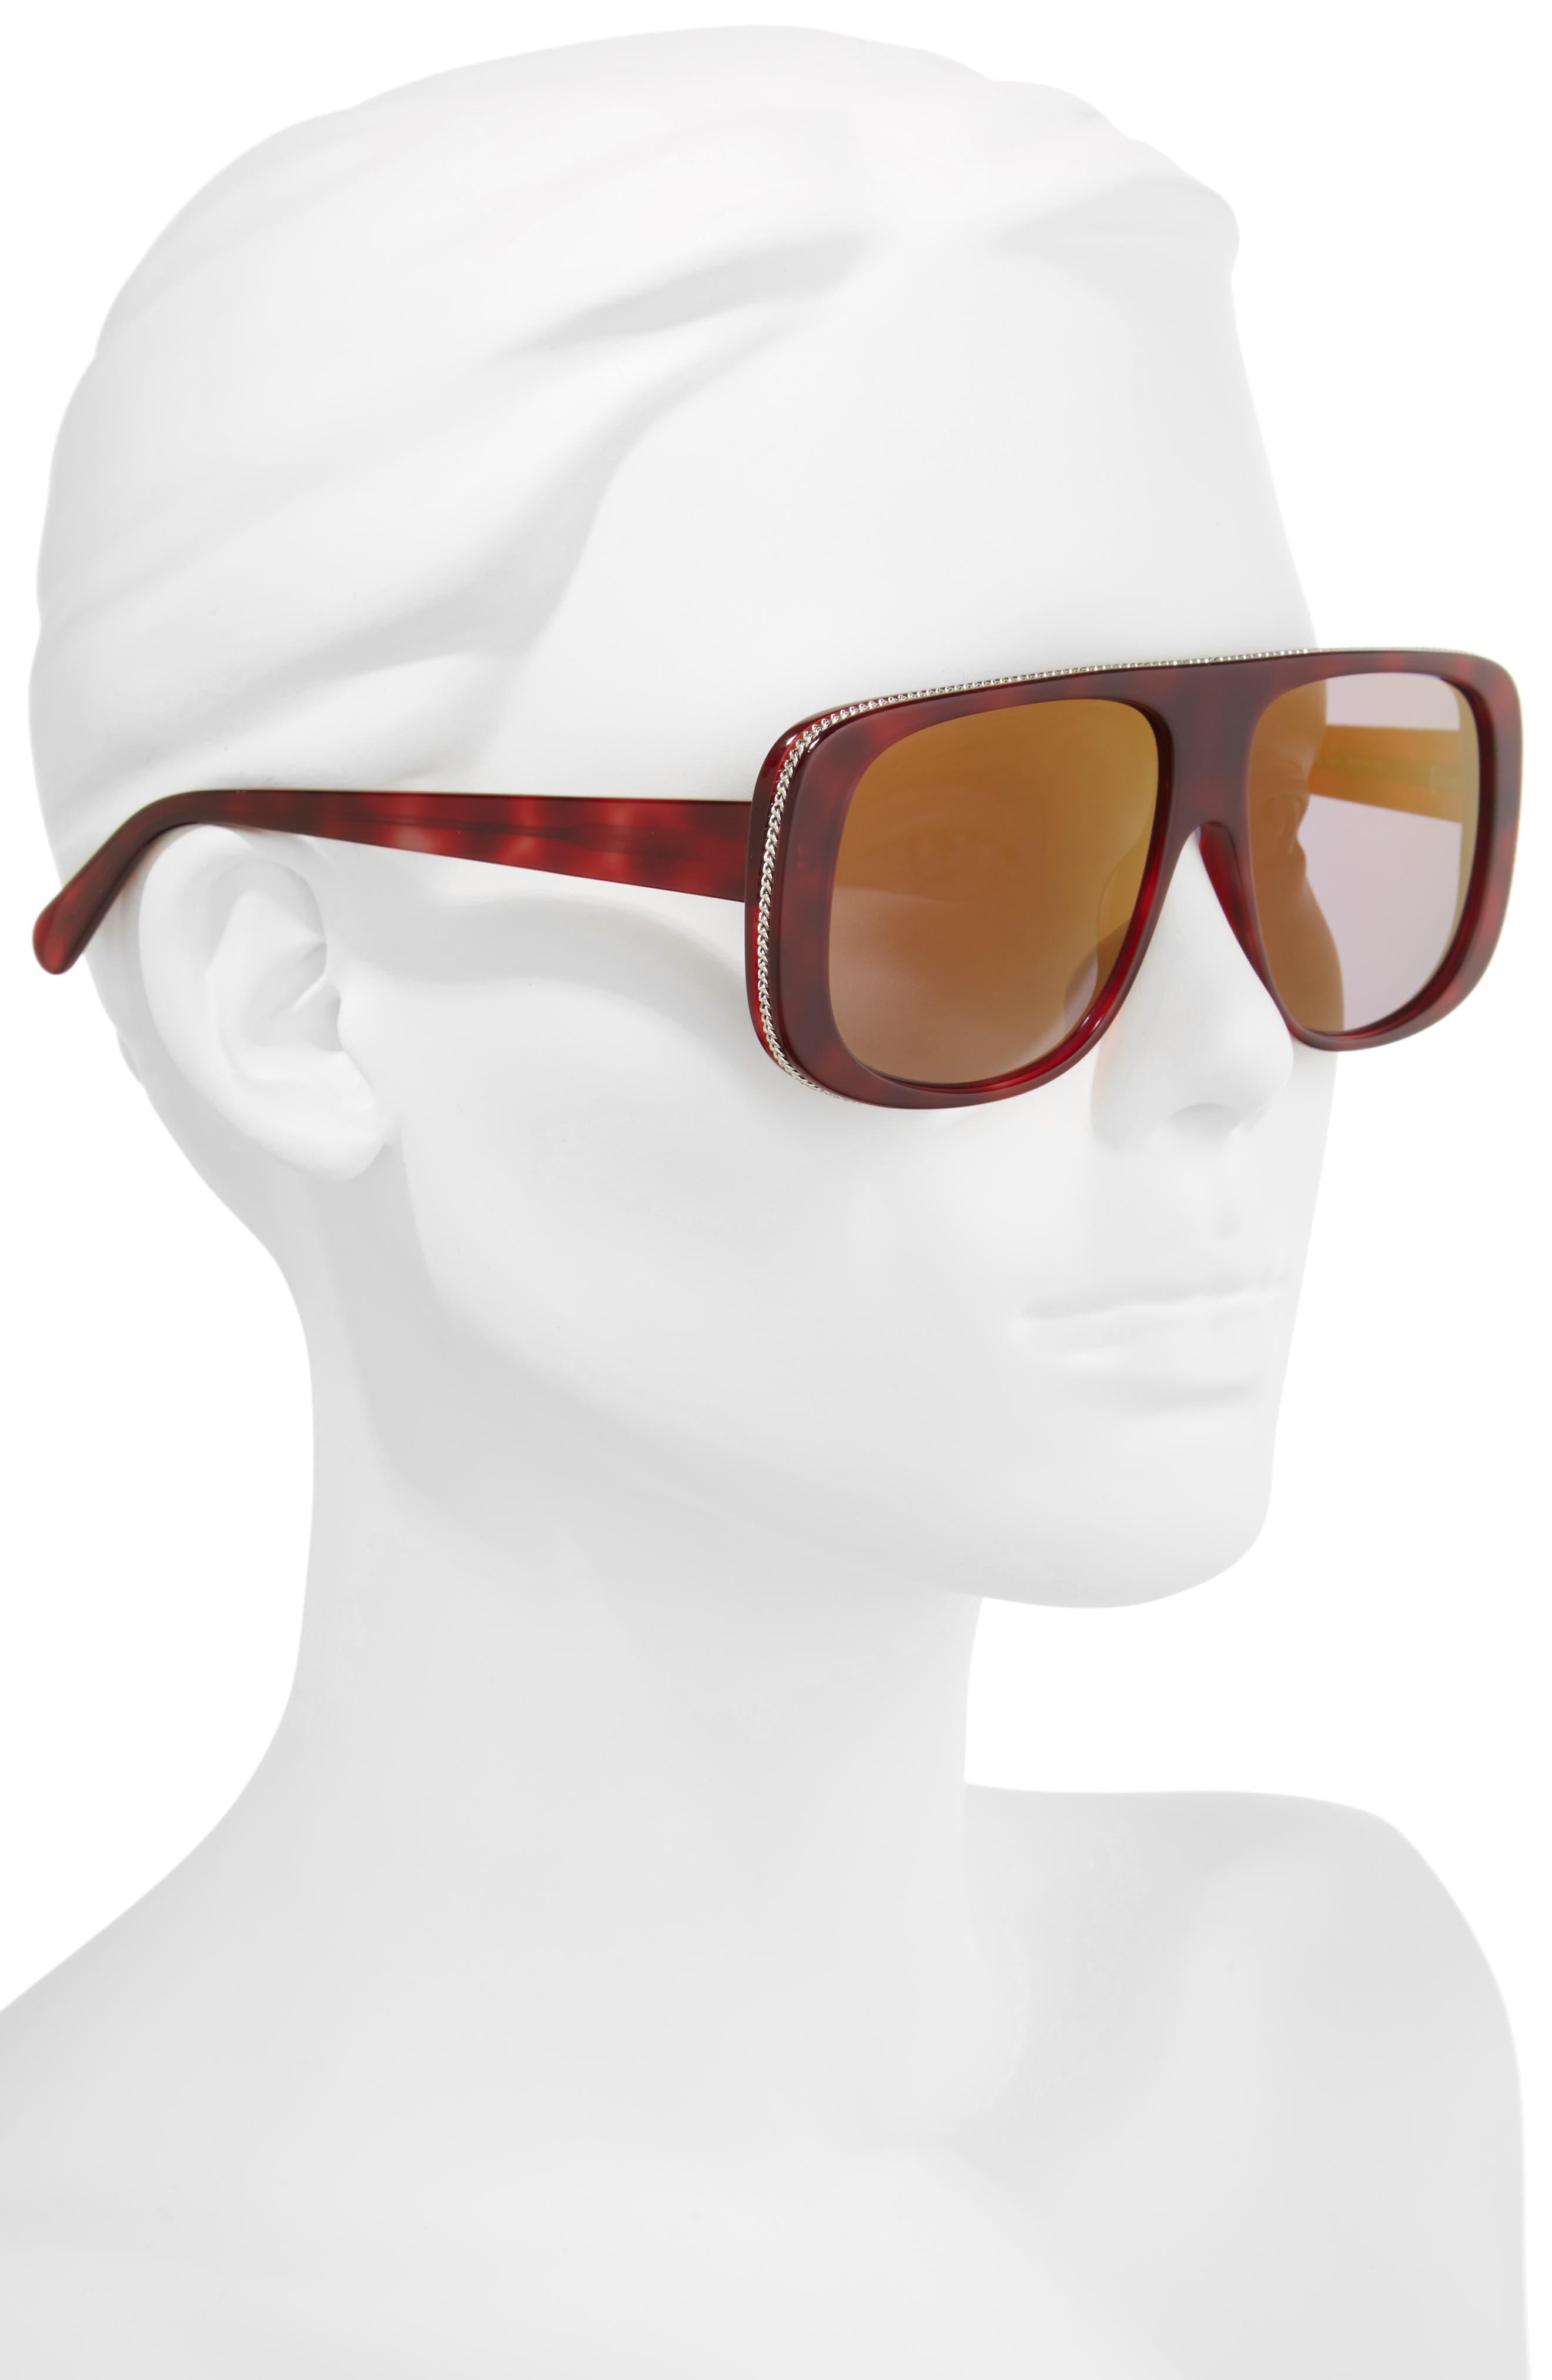 57mm Flat Top Sunglasses,                             Alternate thumbnail 2, color,                             Avana